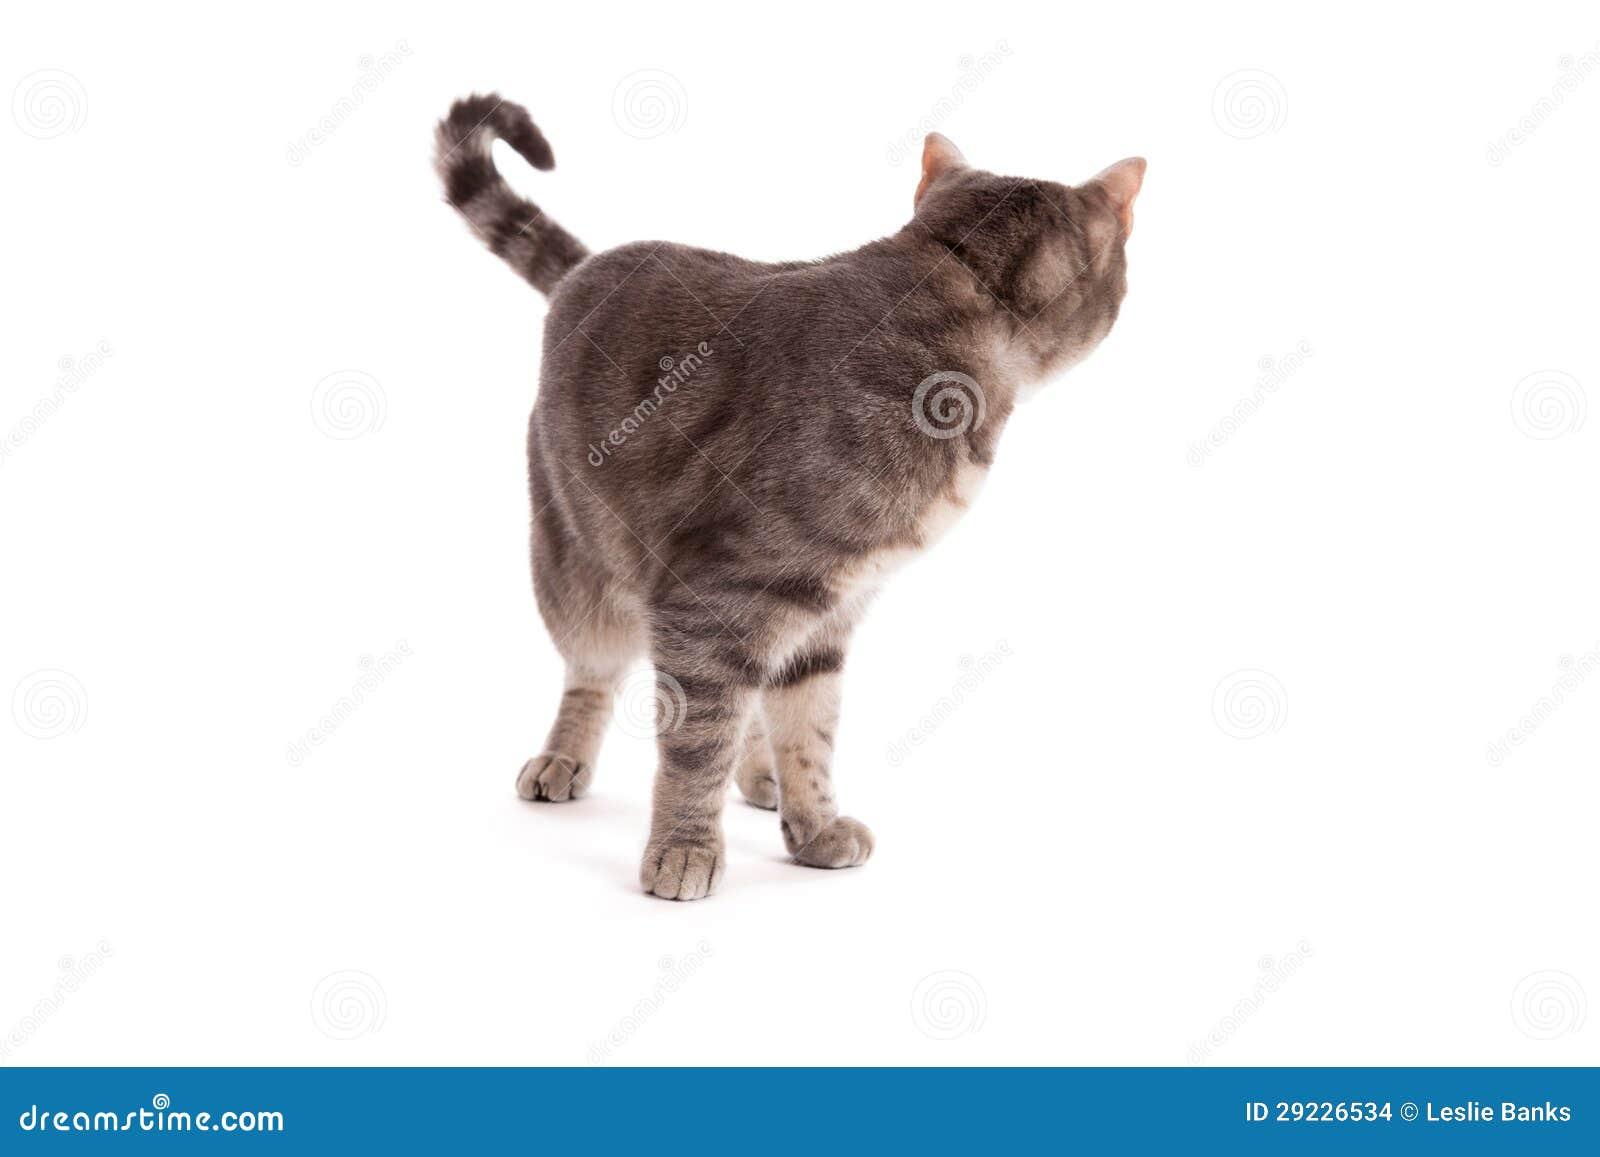 cat keeps howling